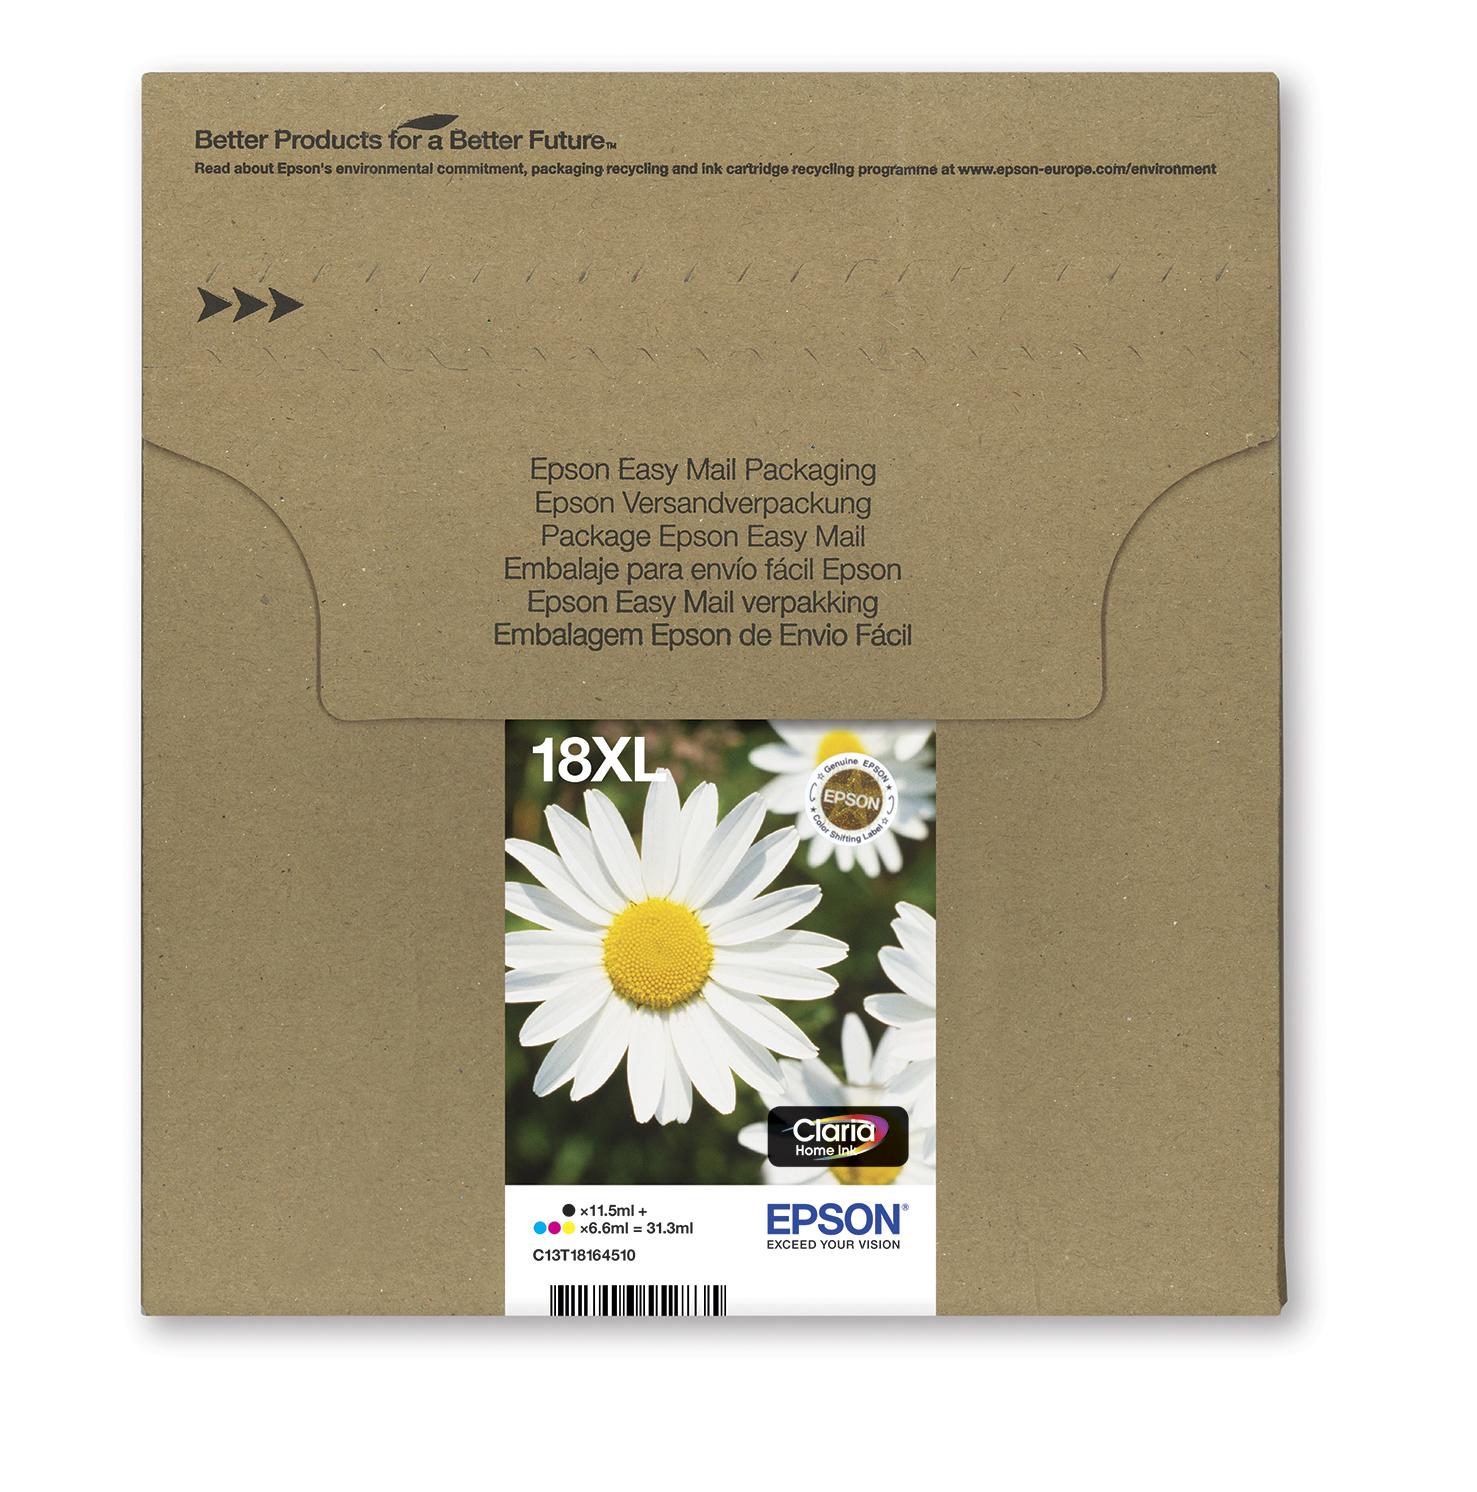 Epson-C13T18164511-Daisy-Multipack-4-colours-18XL-EasyMail-Original thumbnail 4